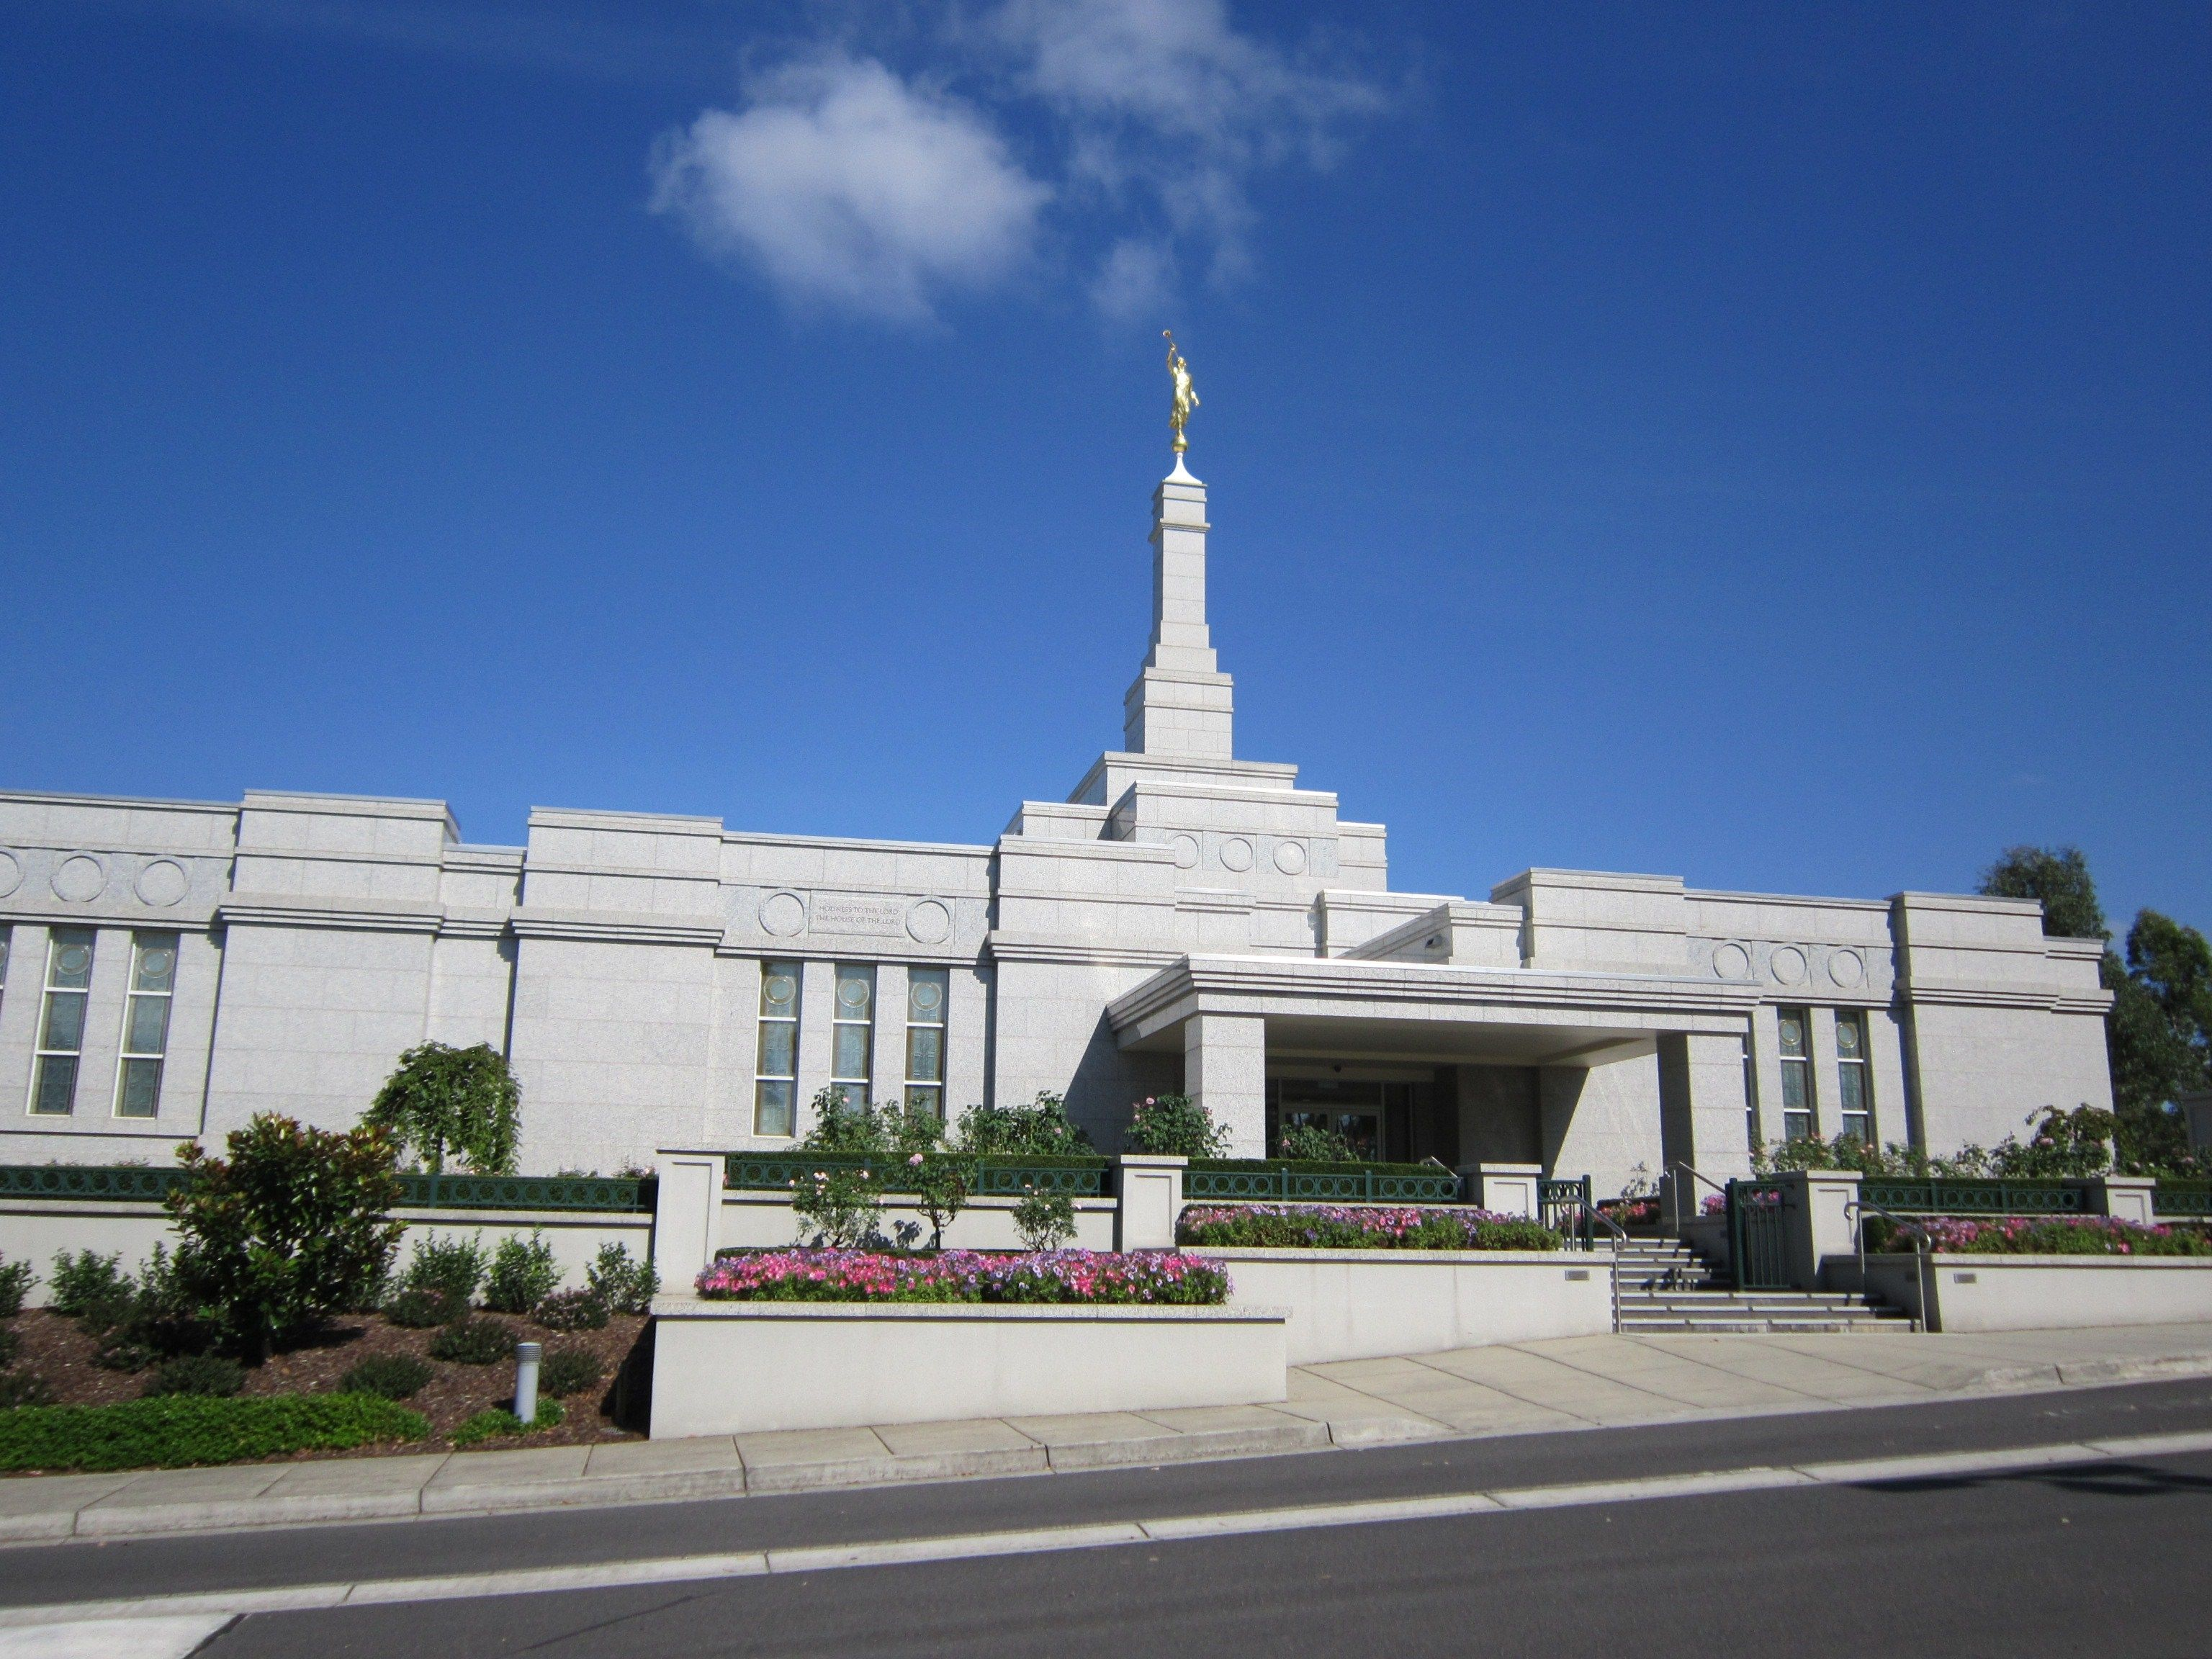 The Melbourne Australia Temple entrance, including scenery.